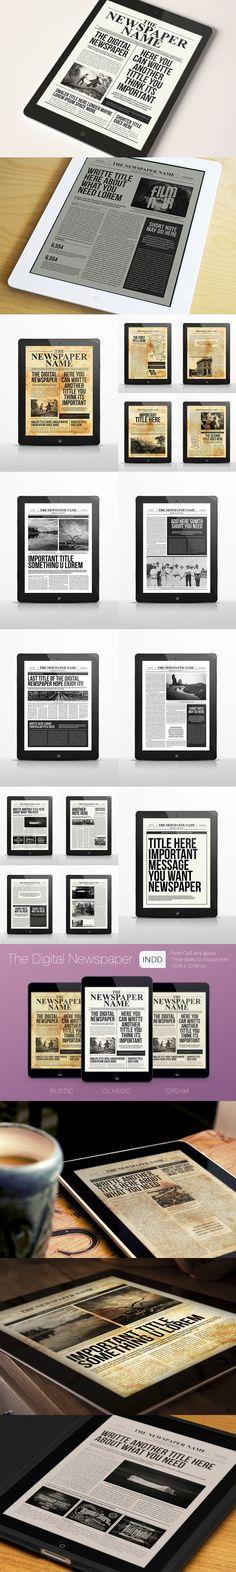 Magazine Template Magazine Templates Pinterest Template and